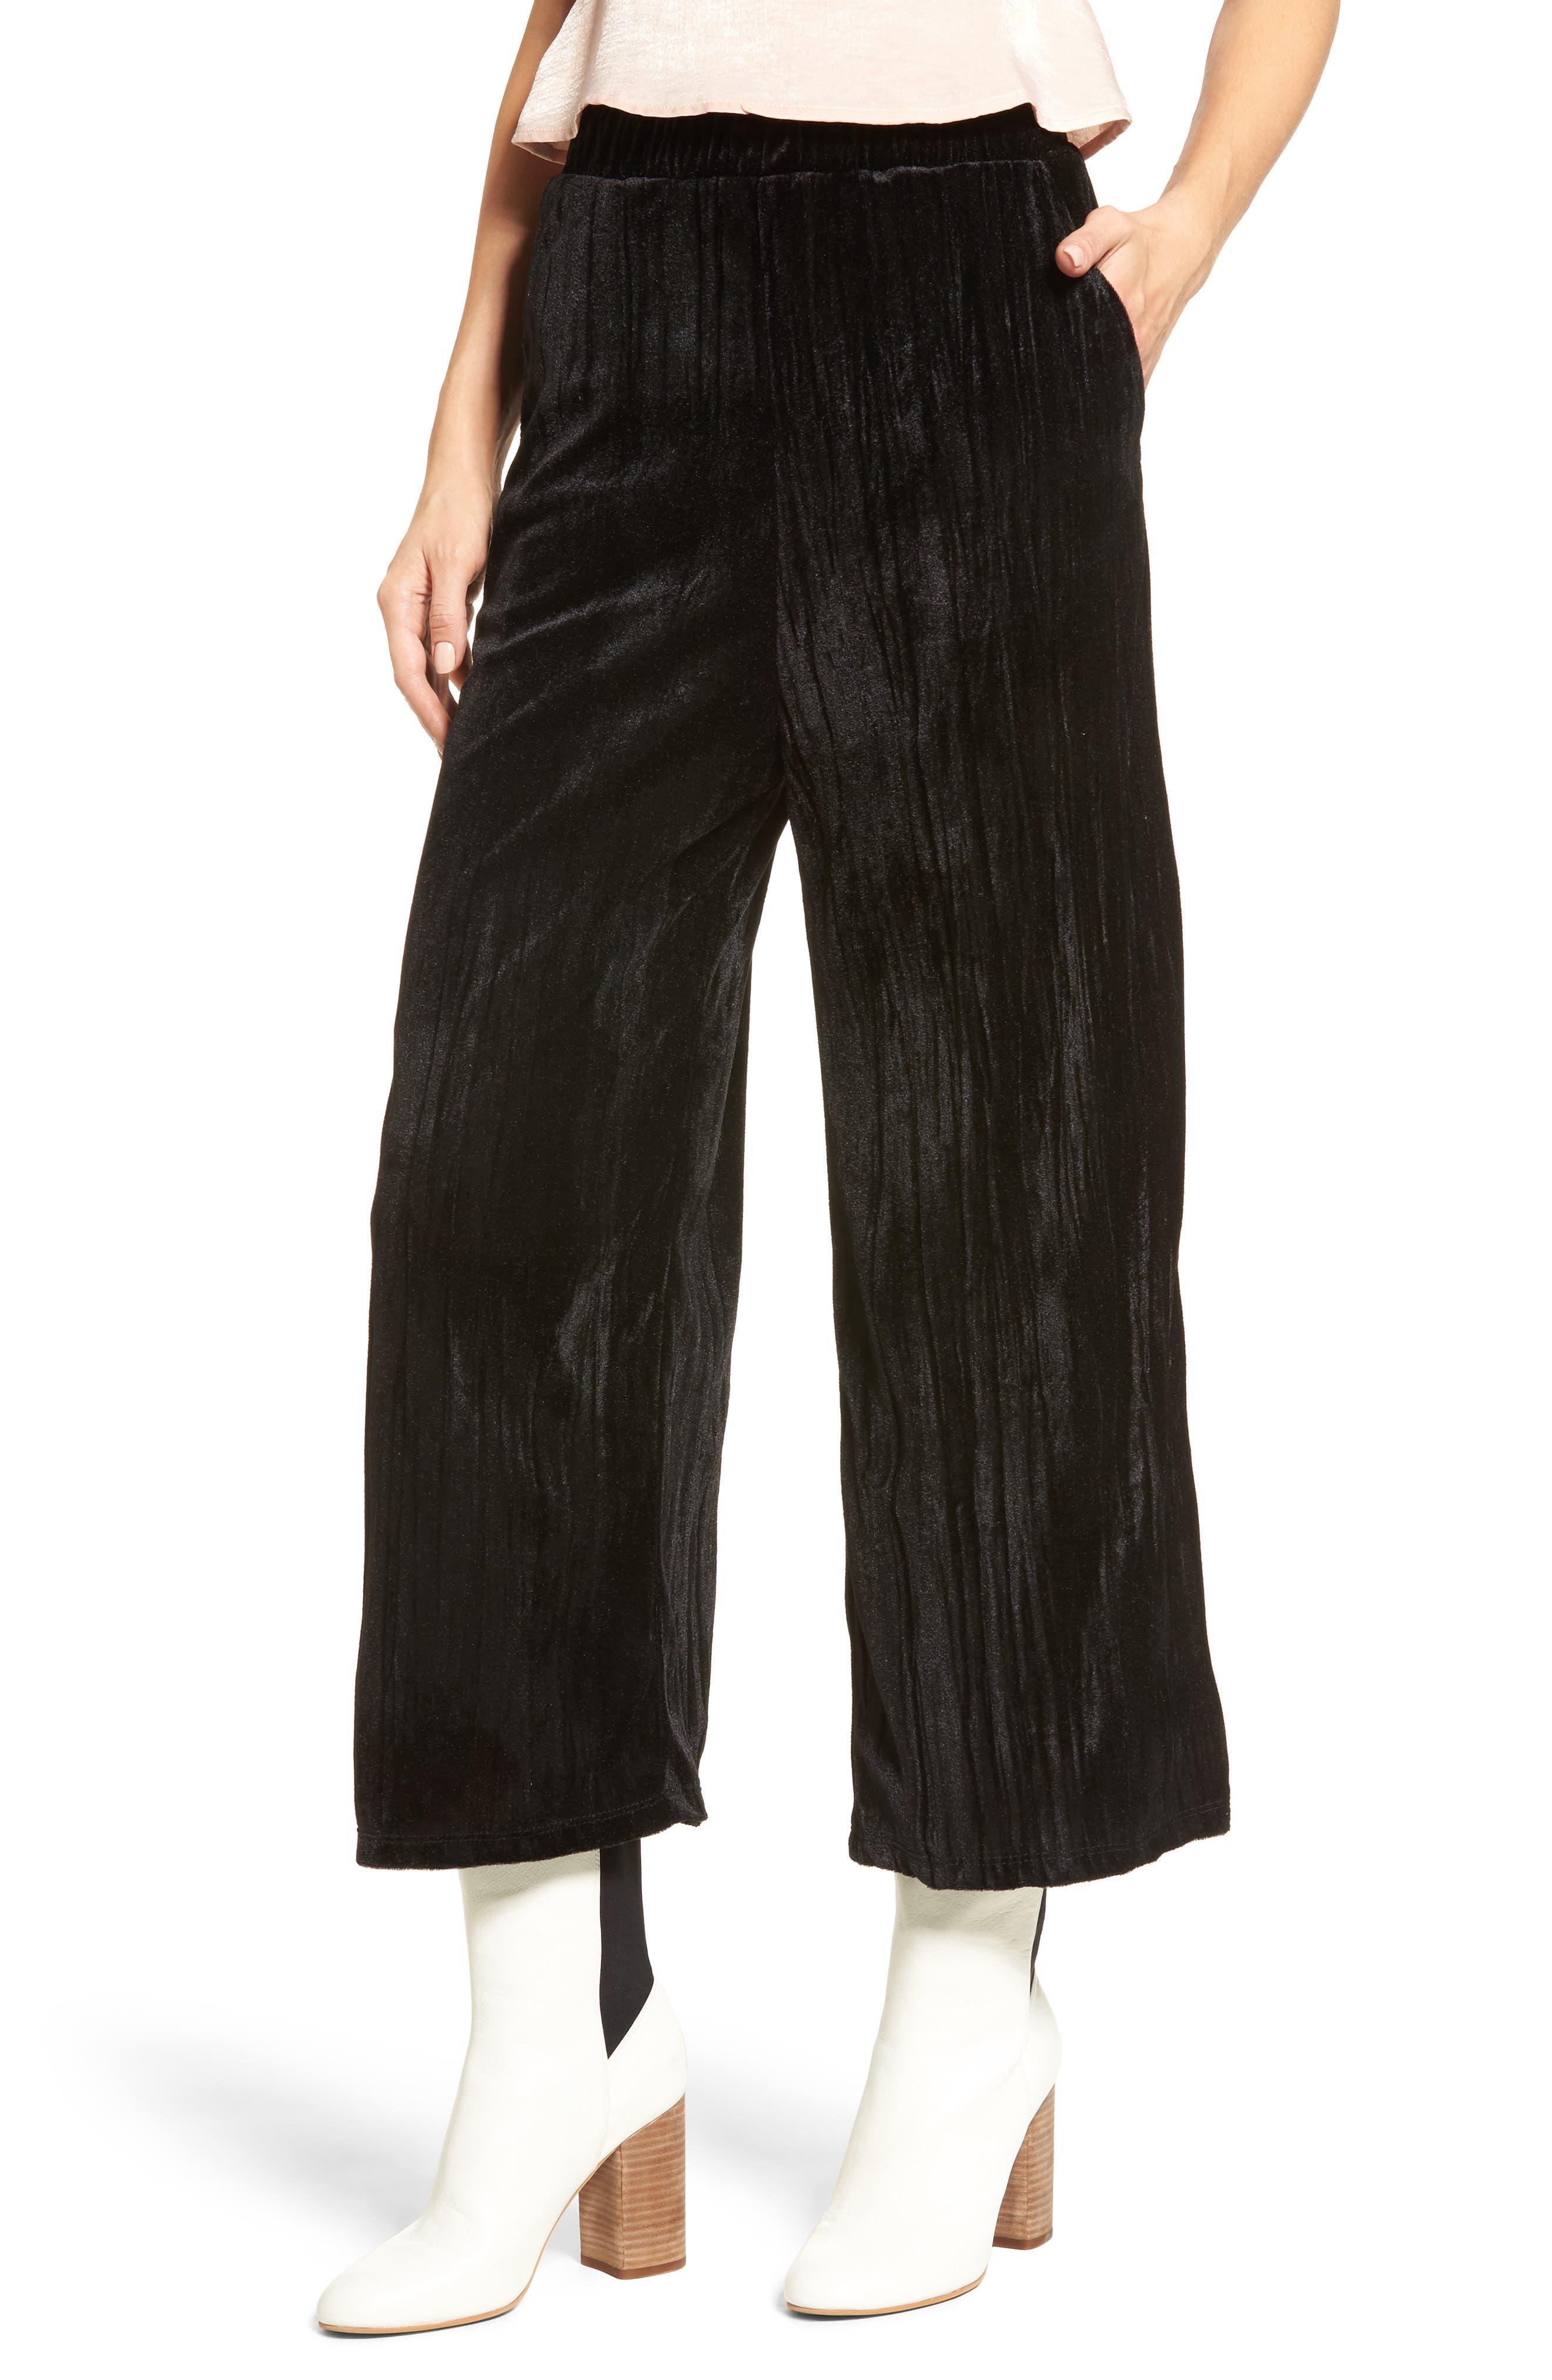 Mimi Chica Velvet Culottes